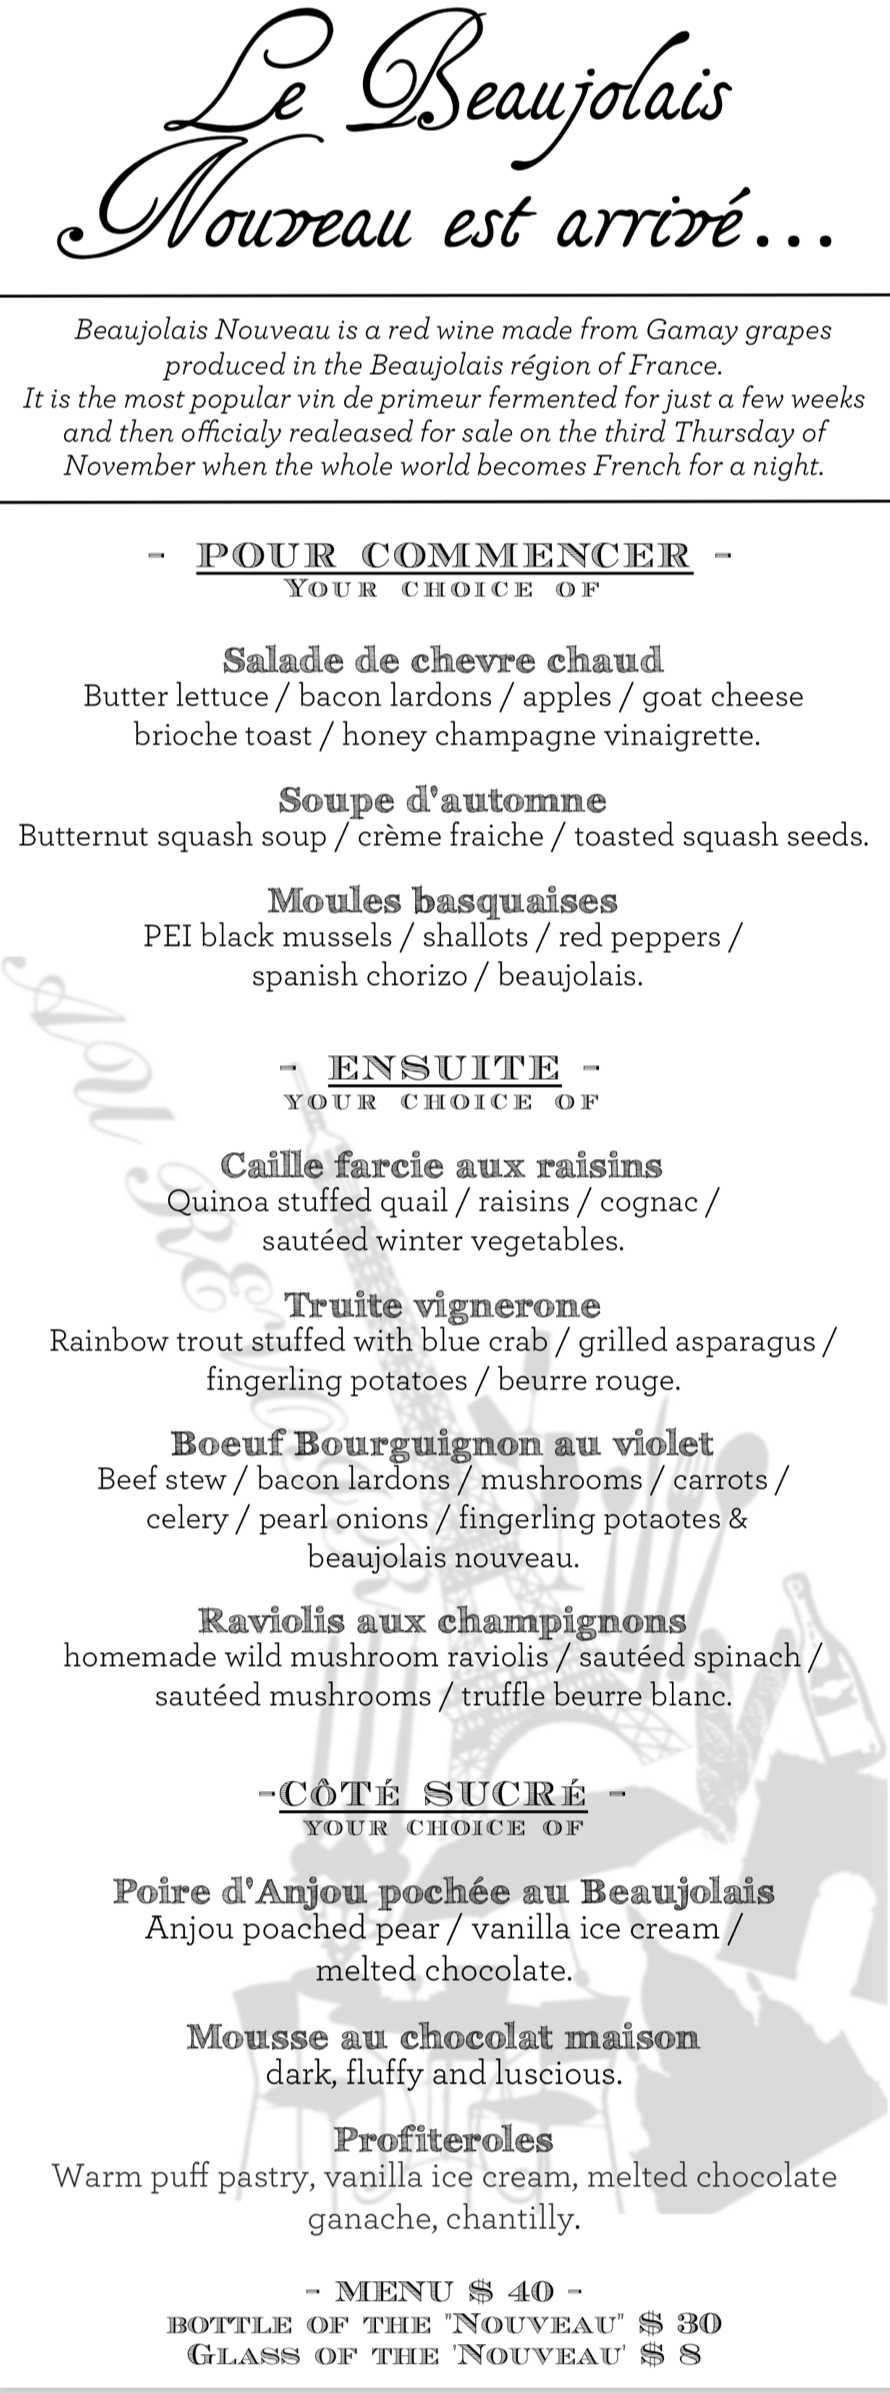 Beaujolais Nouveau 2017 Dinner Menu - Georges Duboeuf.